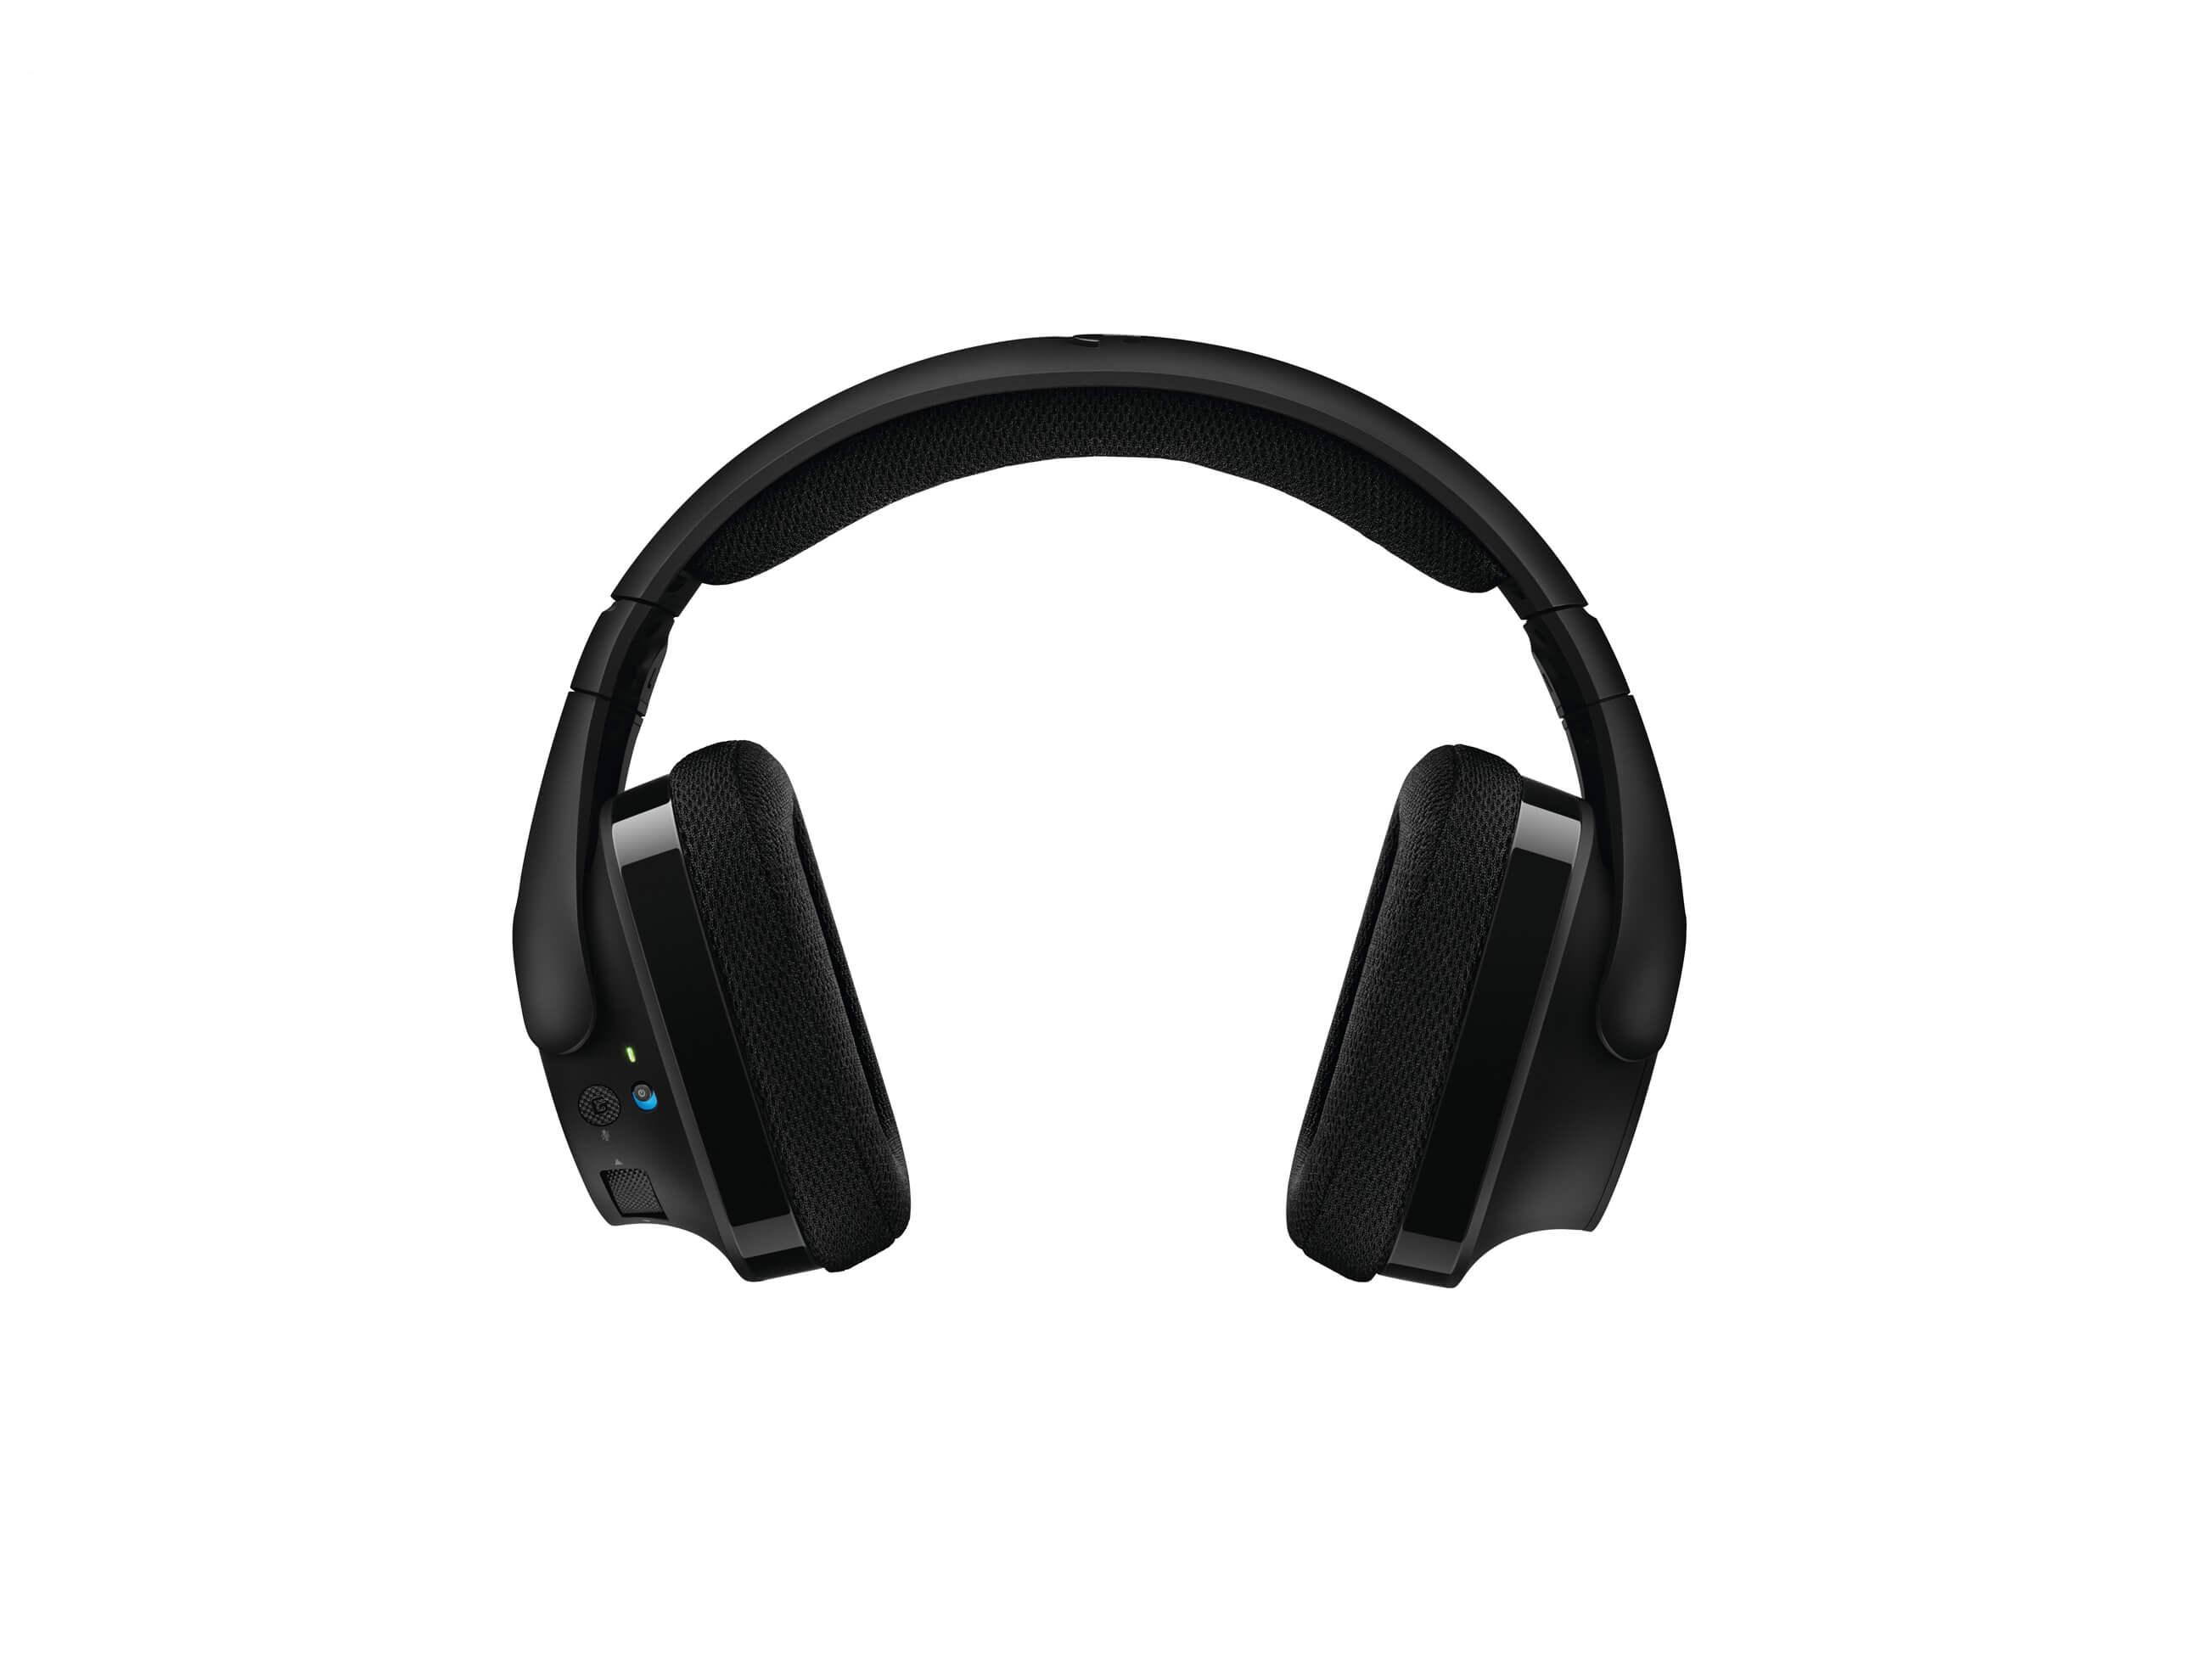 logitech-g533-wireless-gaming-headset-ces-2017-1